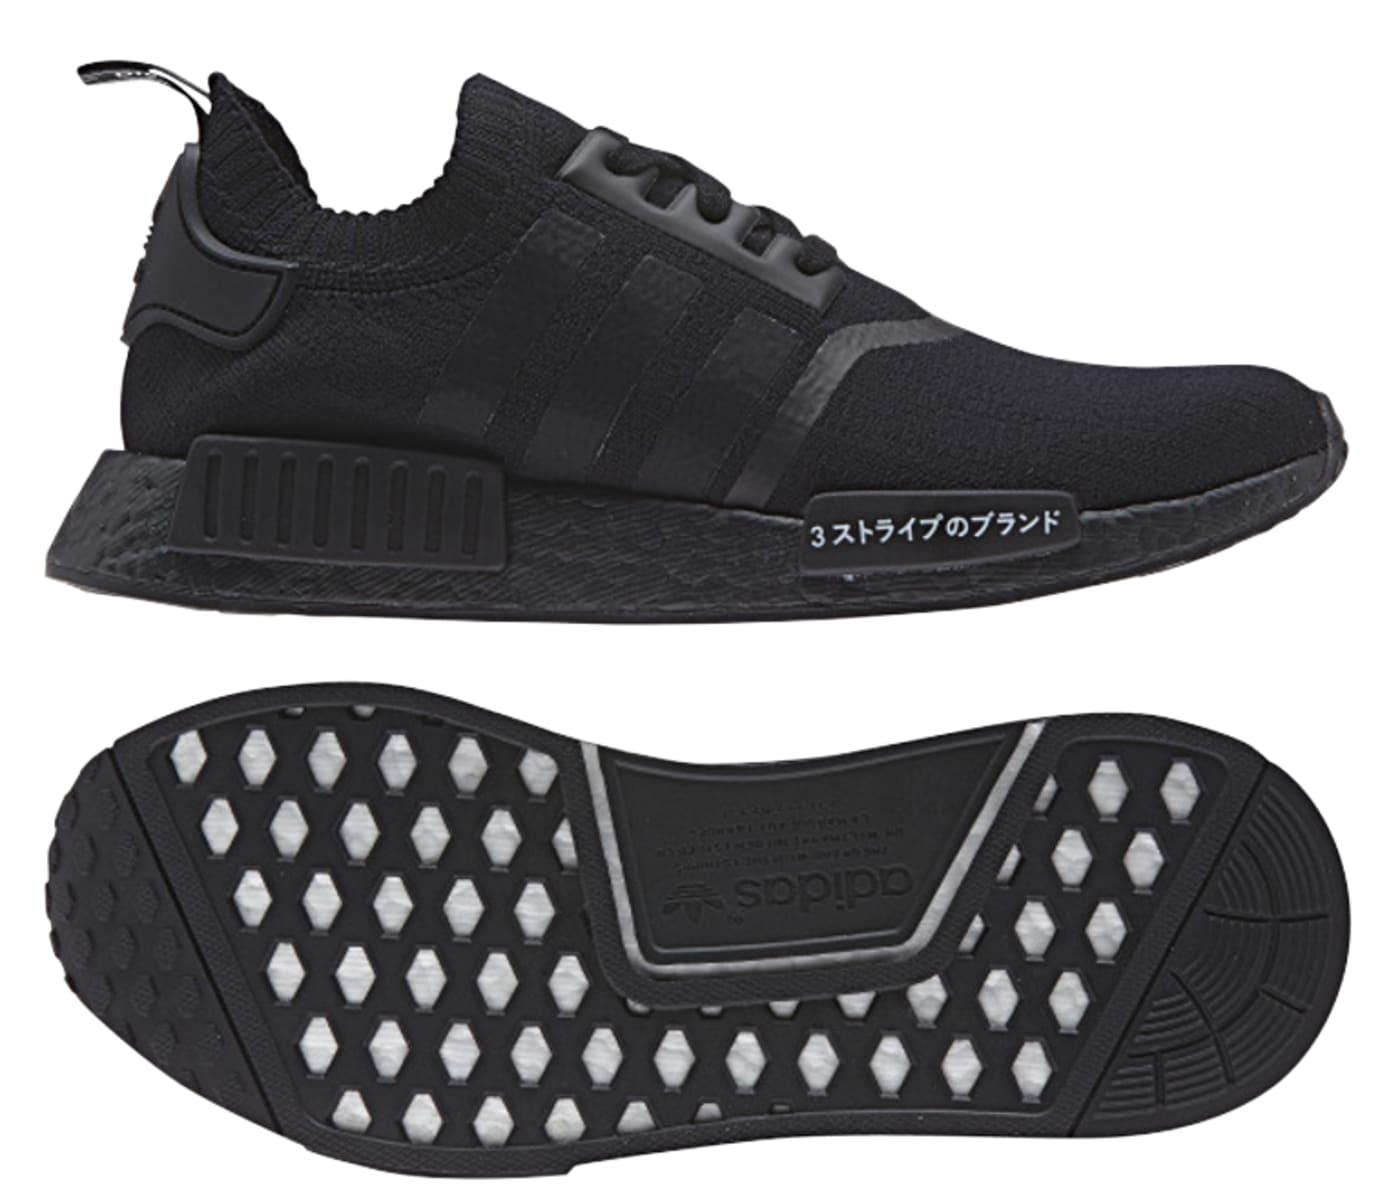 newest 34203 99266 Image via Japanican · Triple Black Adidas NMD Japan Pack